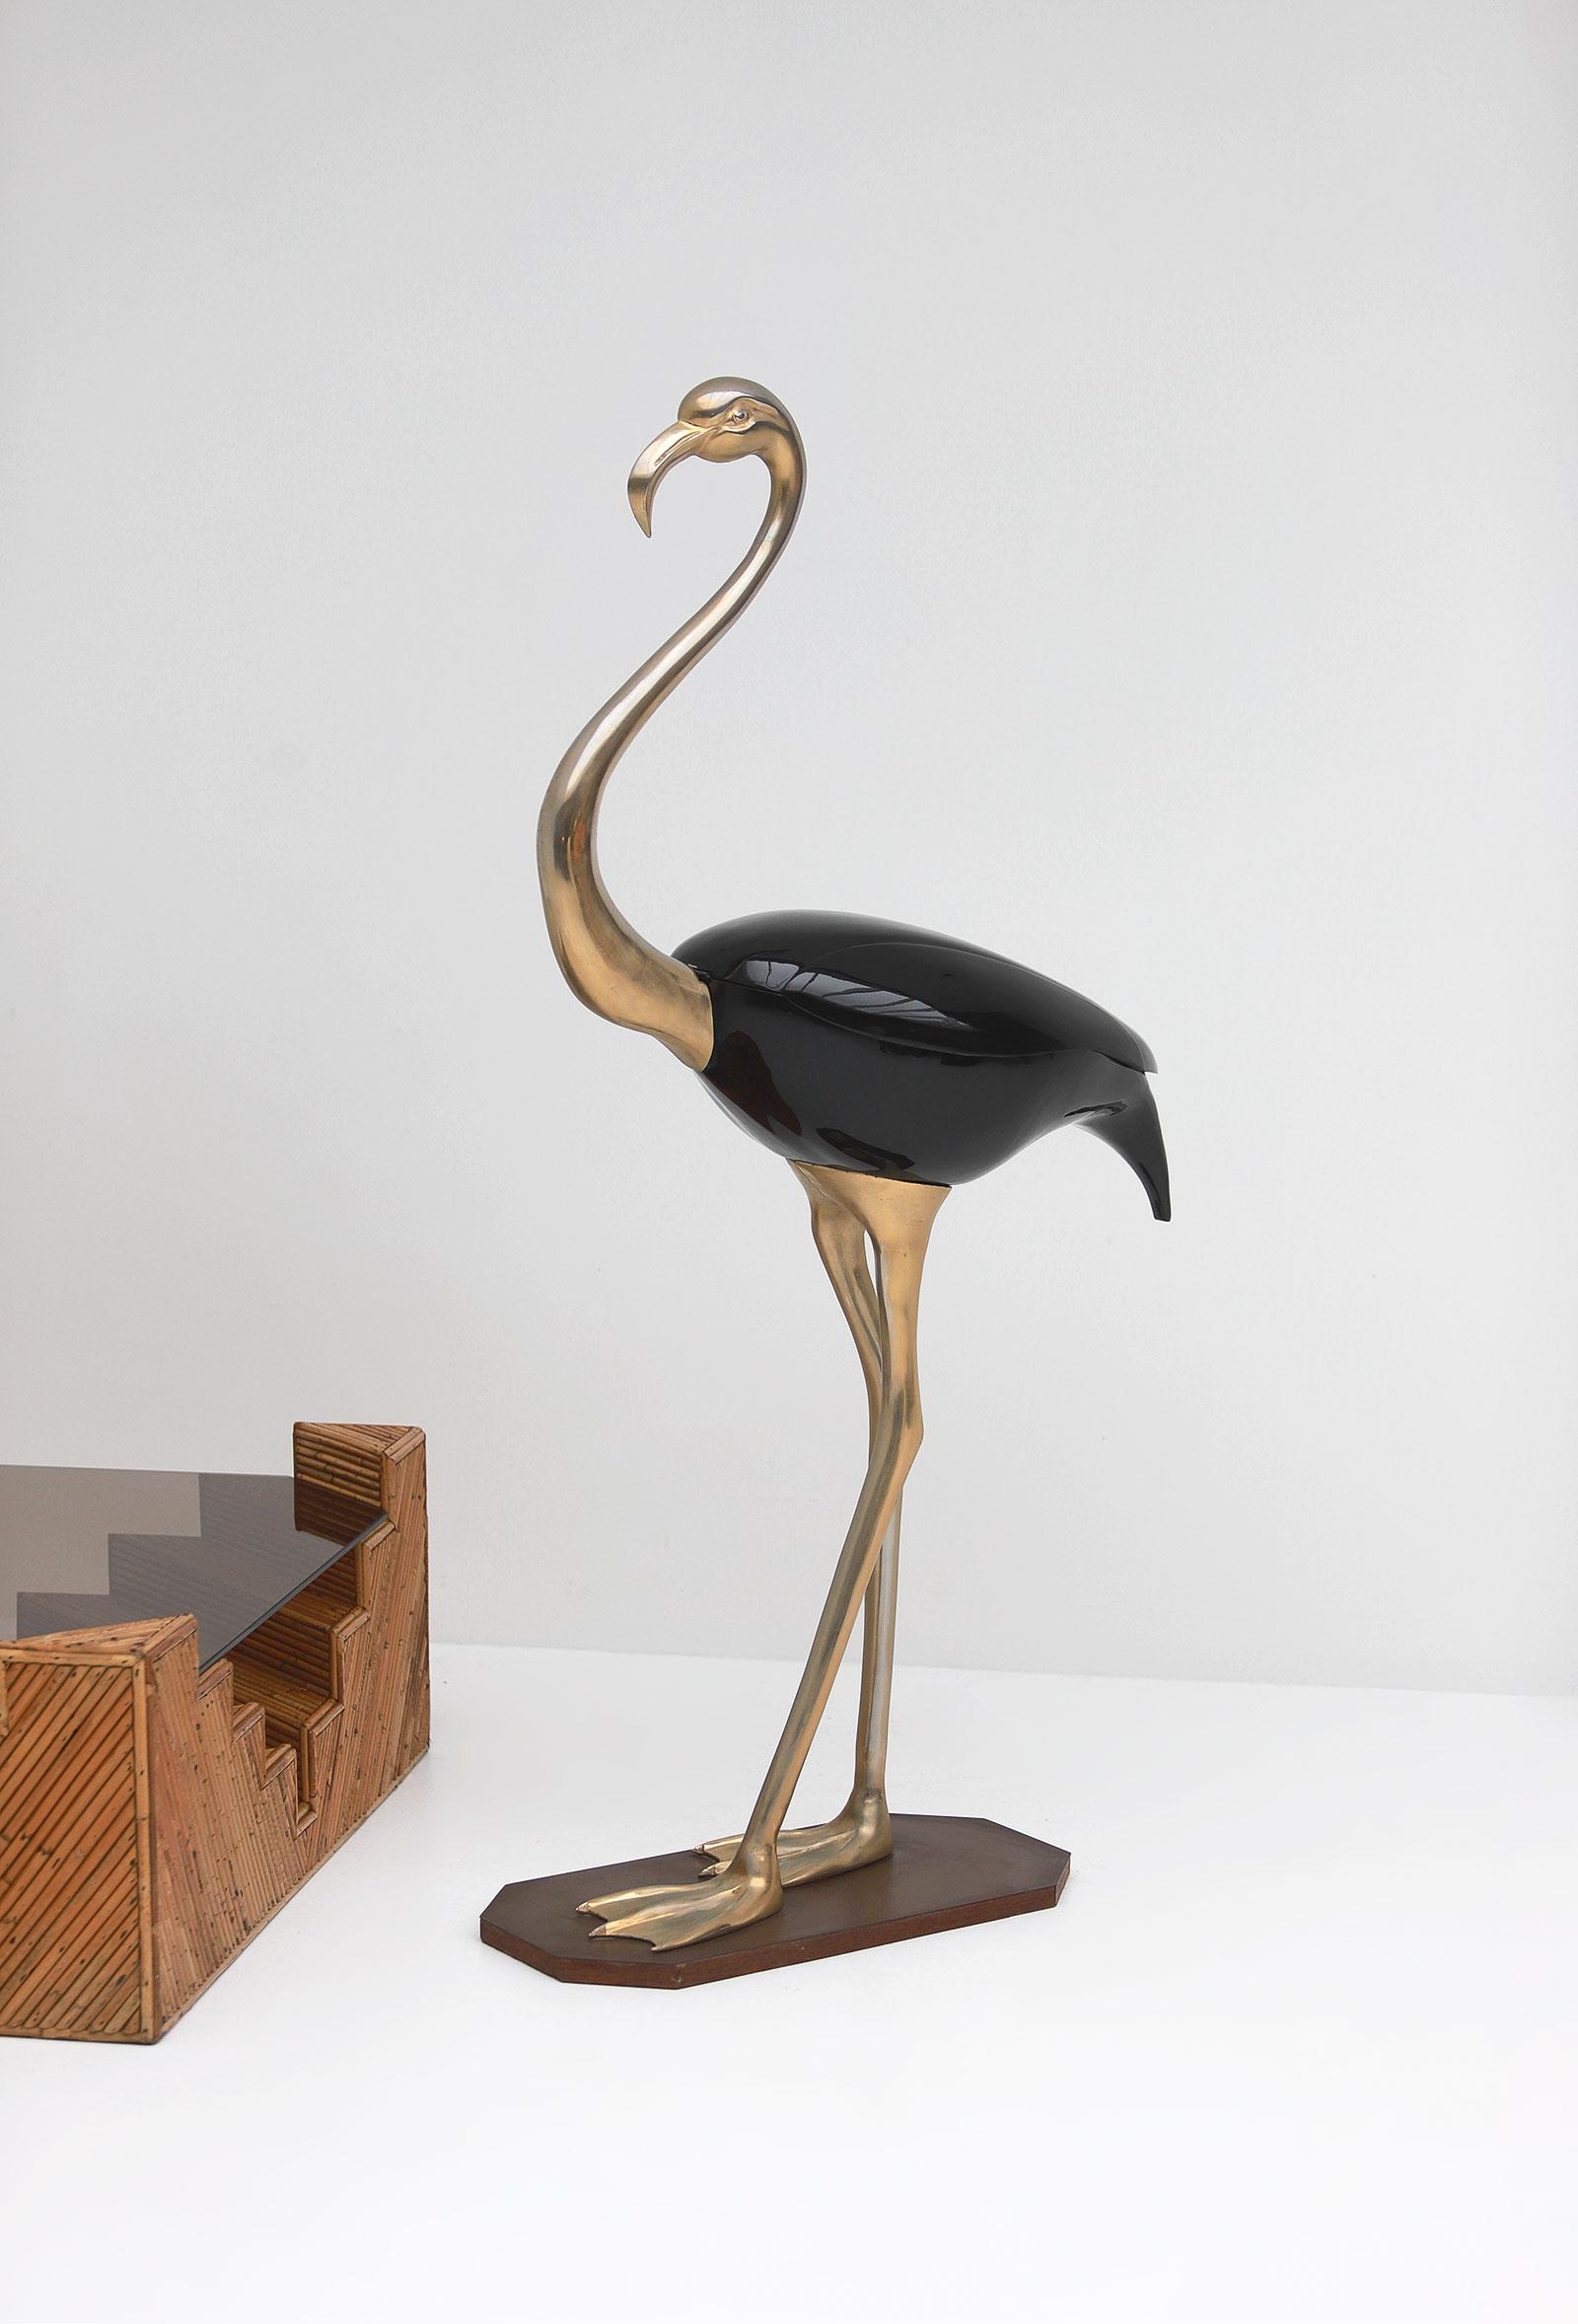 Fondica Lifesize Brass Flamingo 1970simage 1